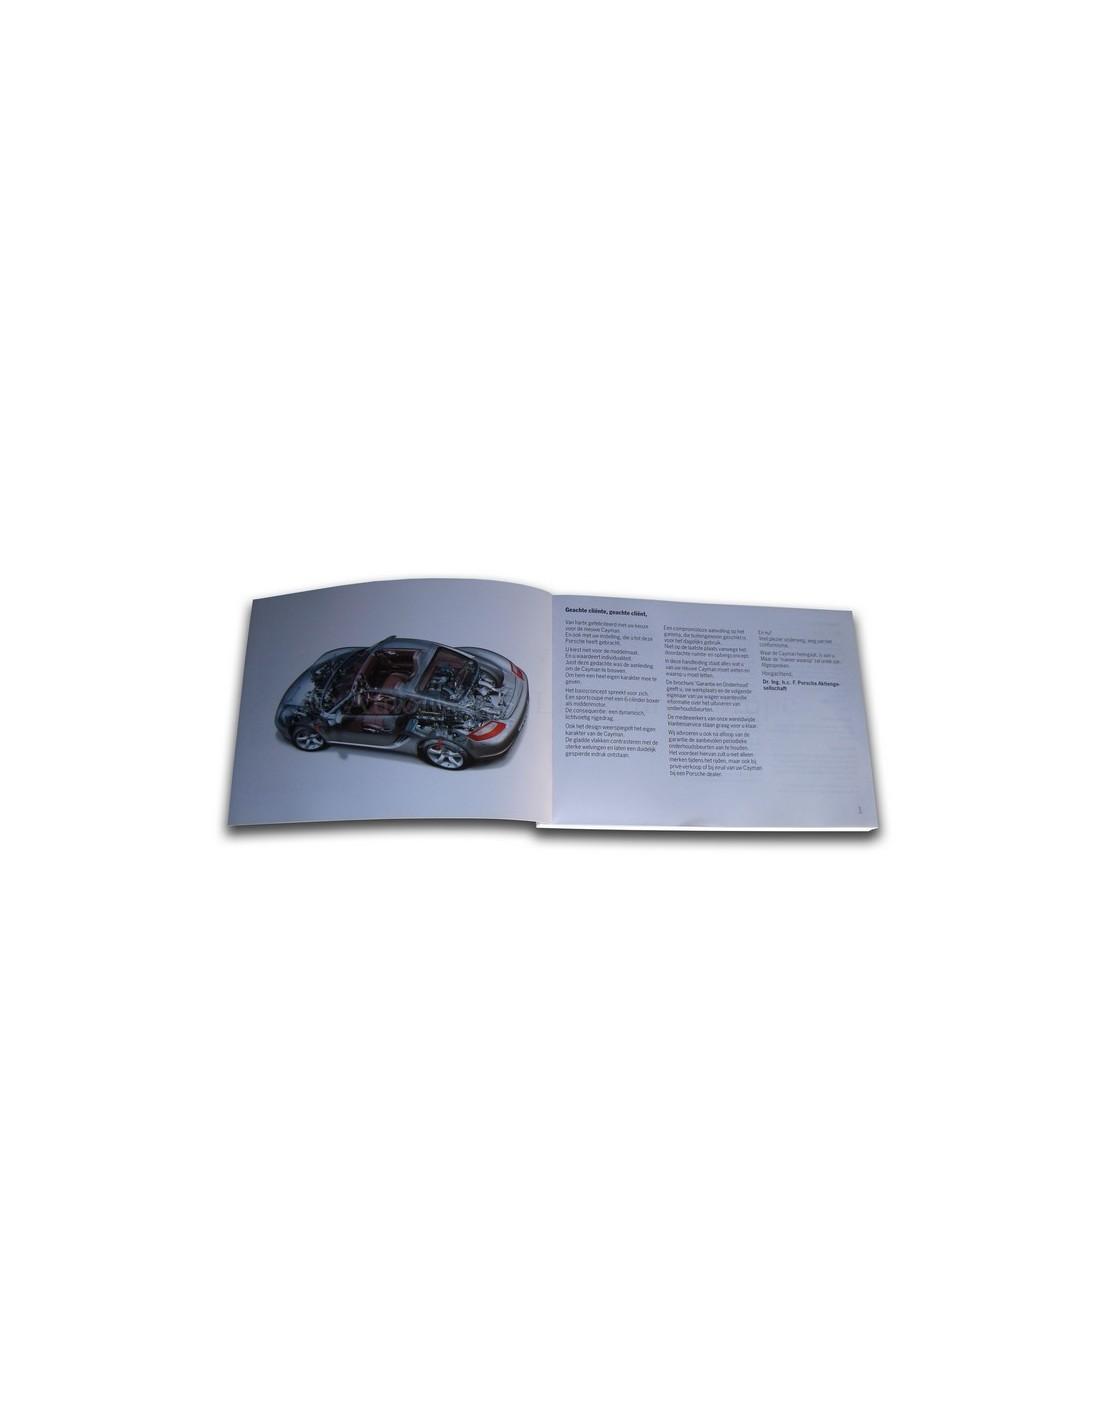 2008 porsche cayman s owners manual handbook german2007 porsche rh autolit eu 2007 porsche cayman s service manual 2007 porsche cayman s service manual